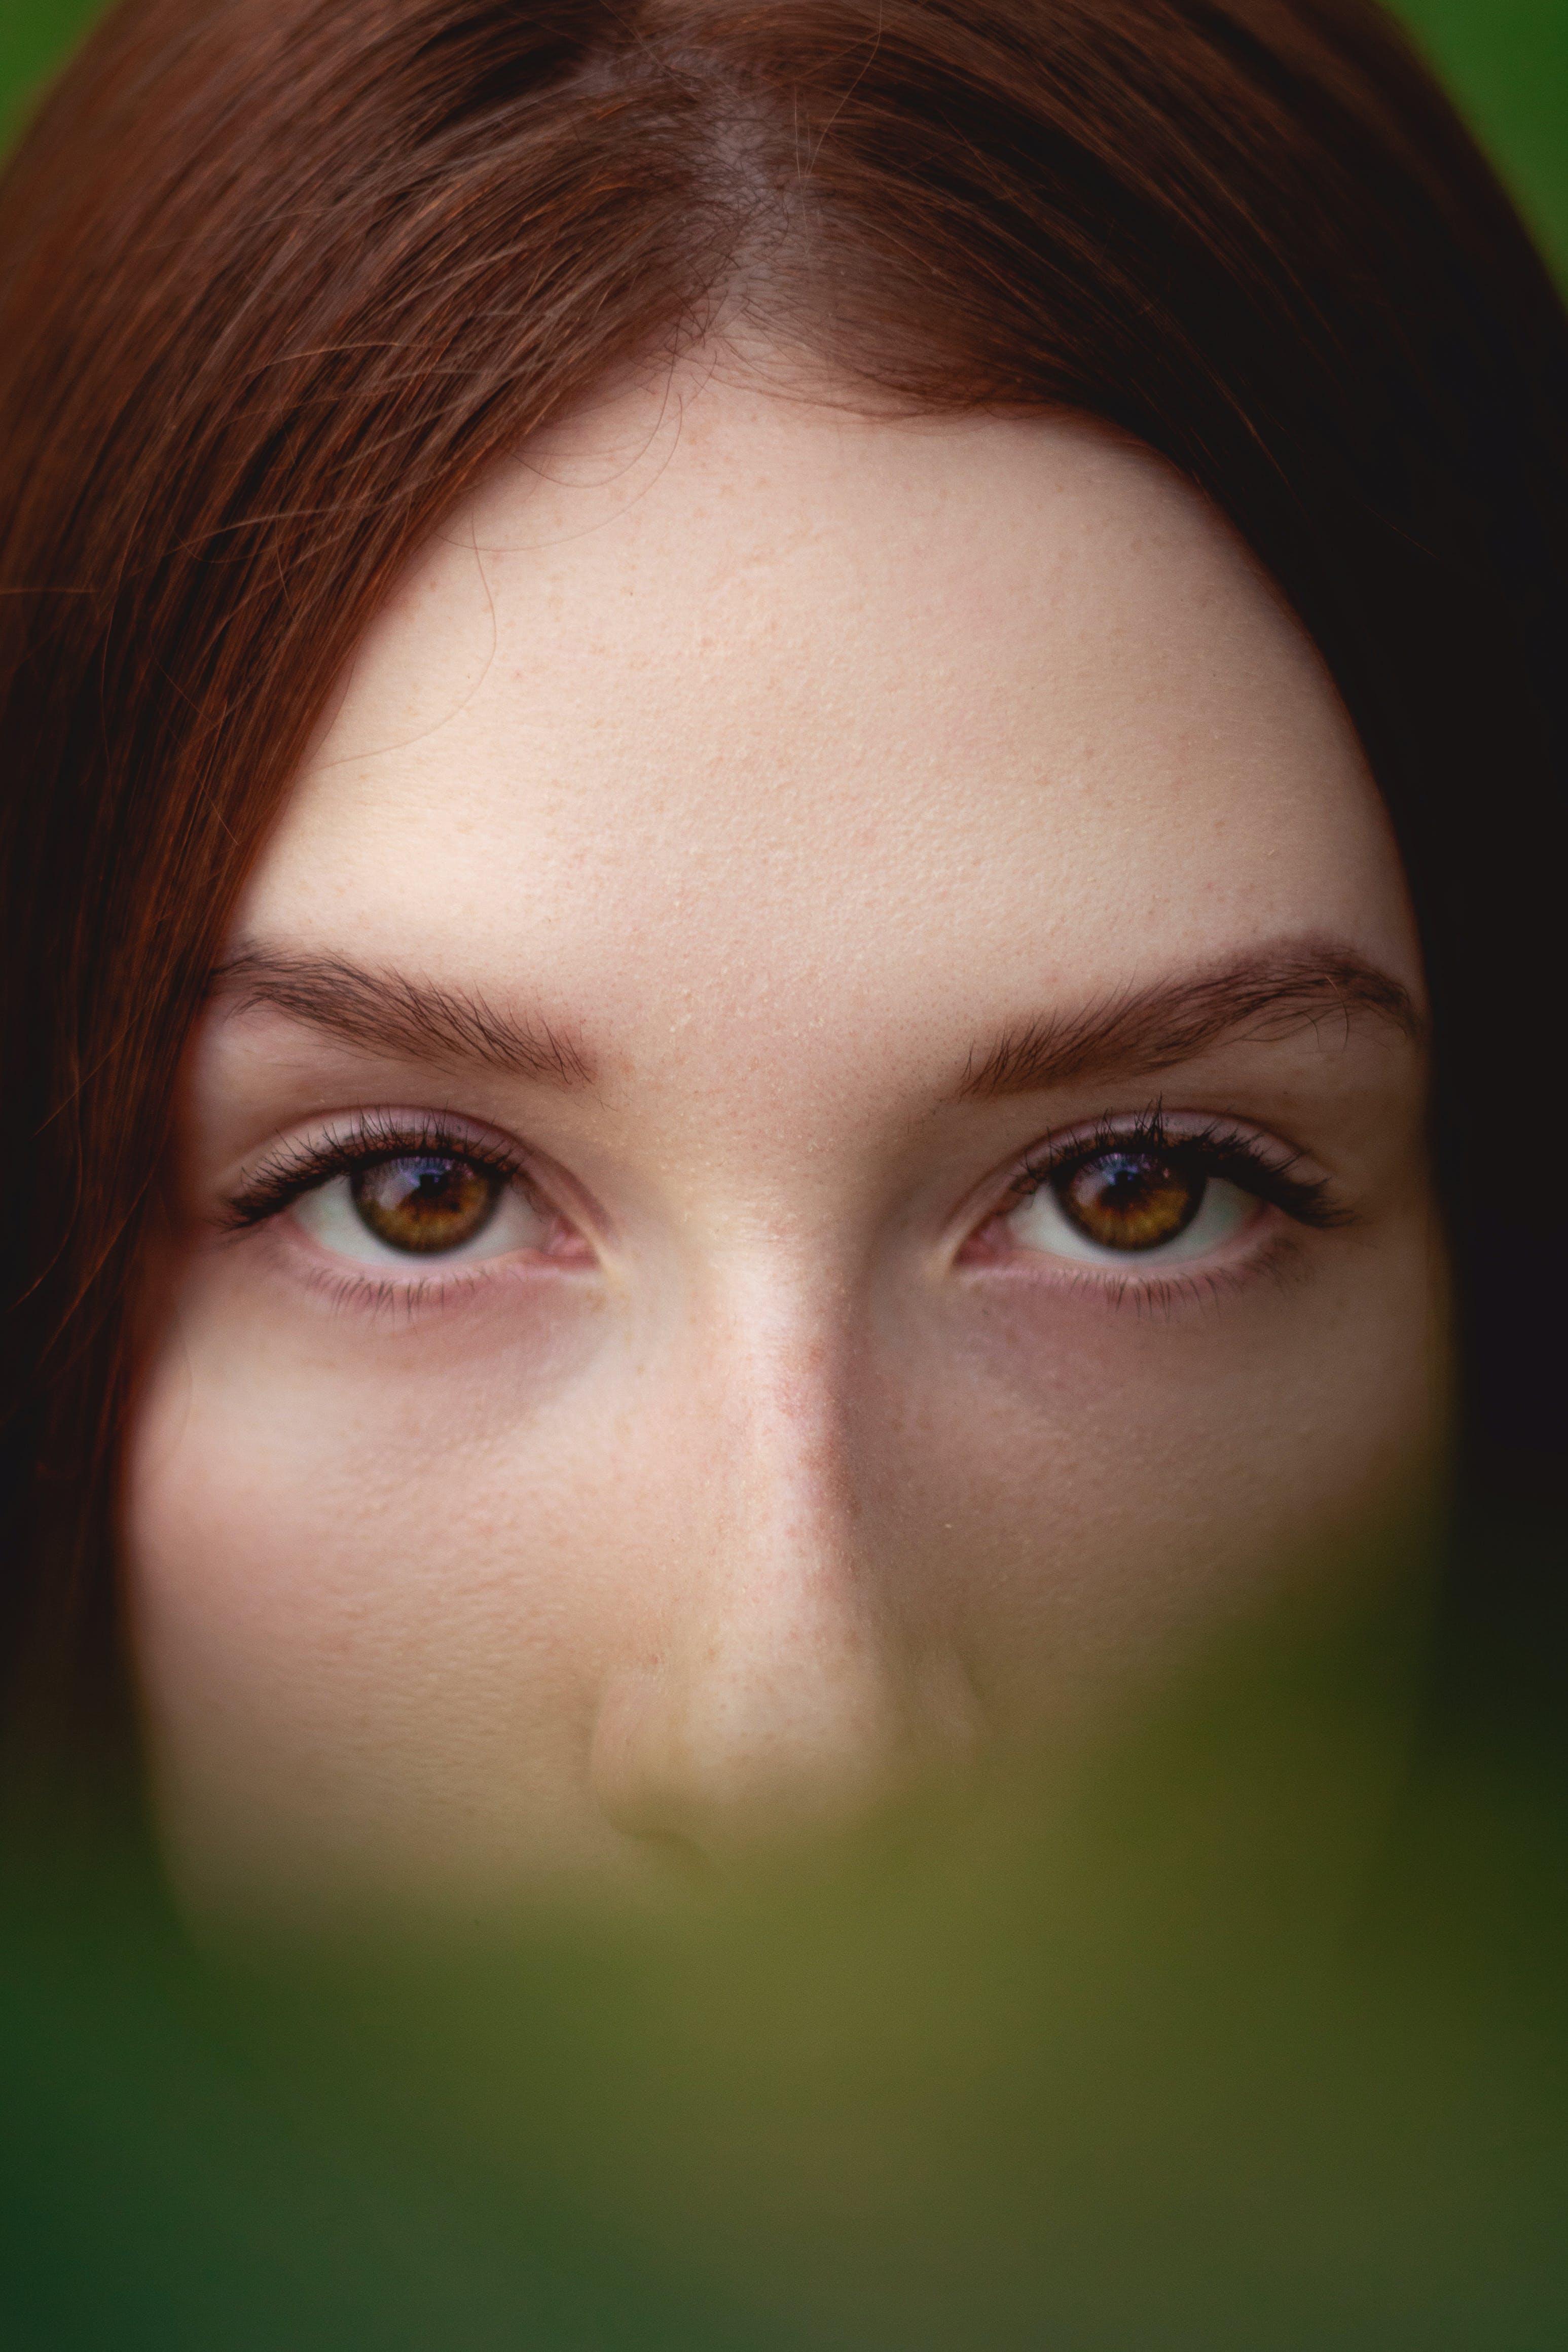 Fotos de stock gratuitas de bonita, cabello, concentrarse, hembra